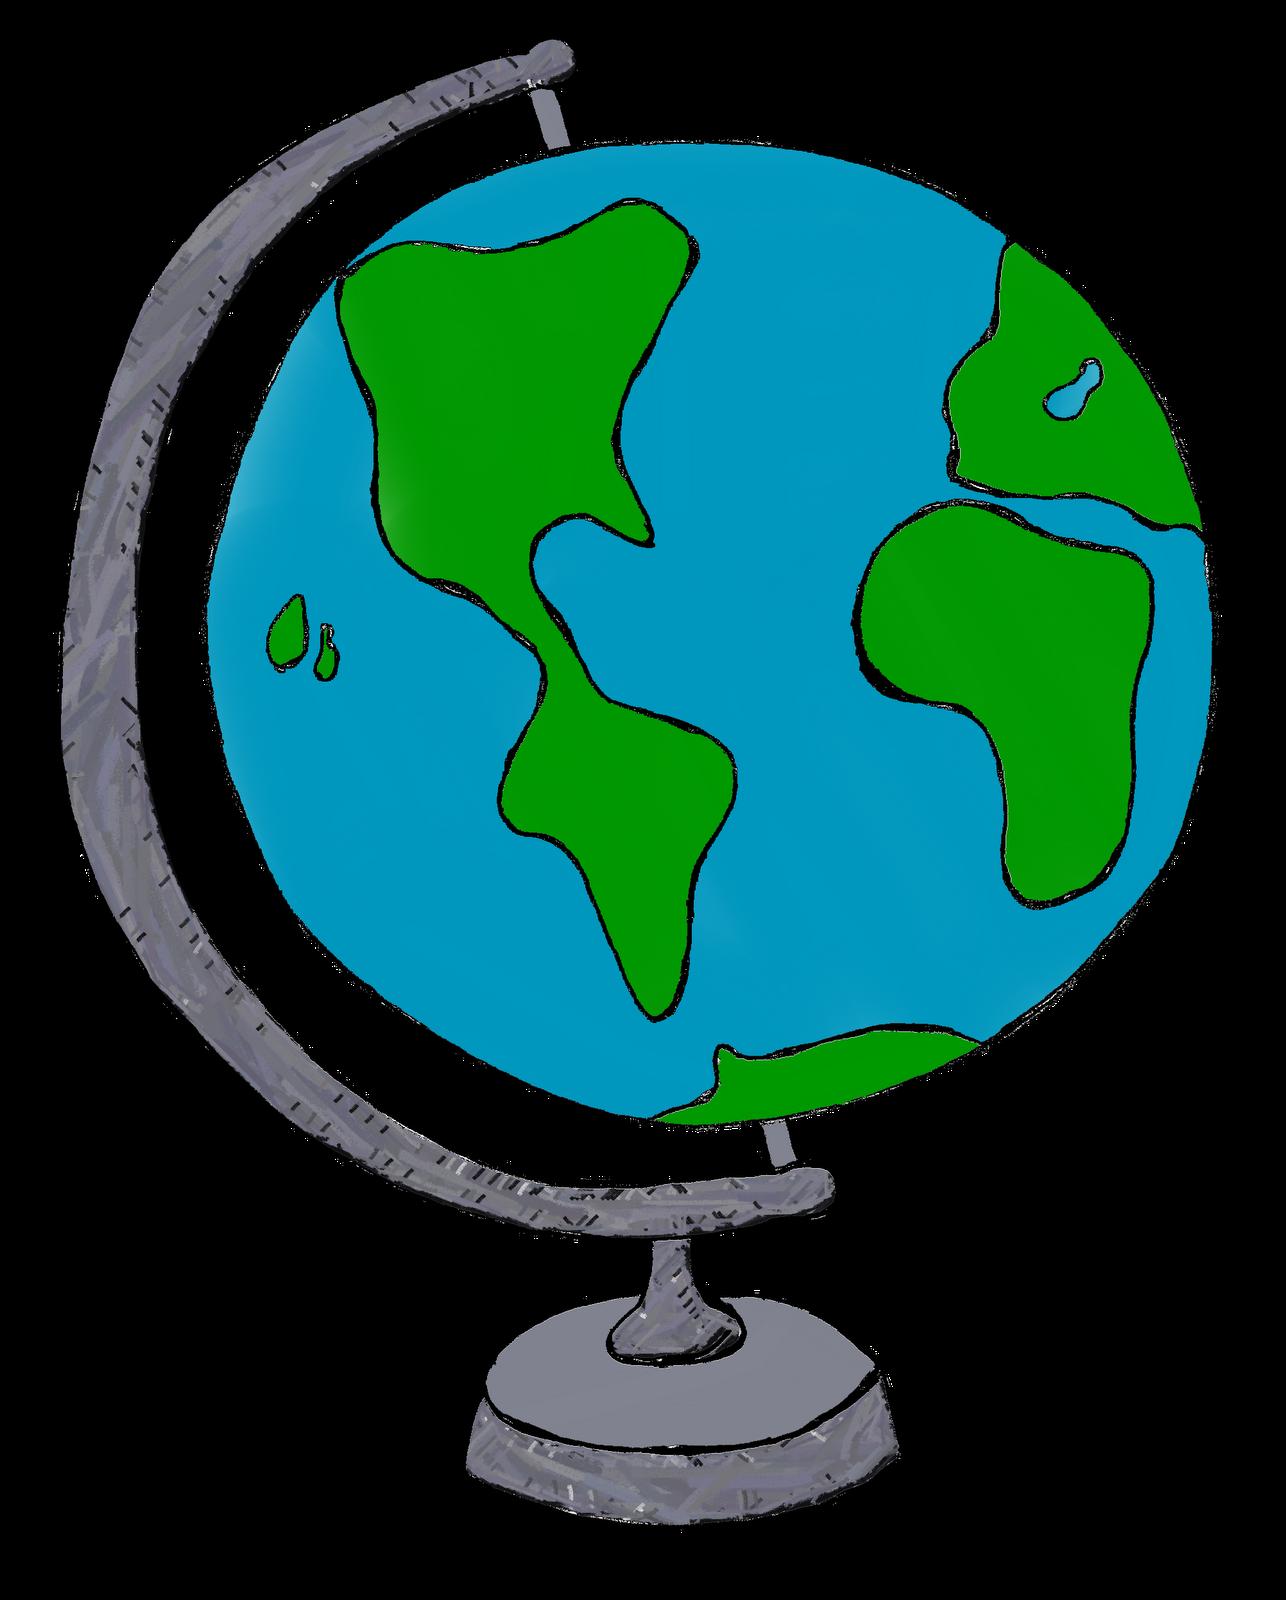 1286x1600 Top 74 Globe Clip Art